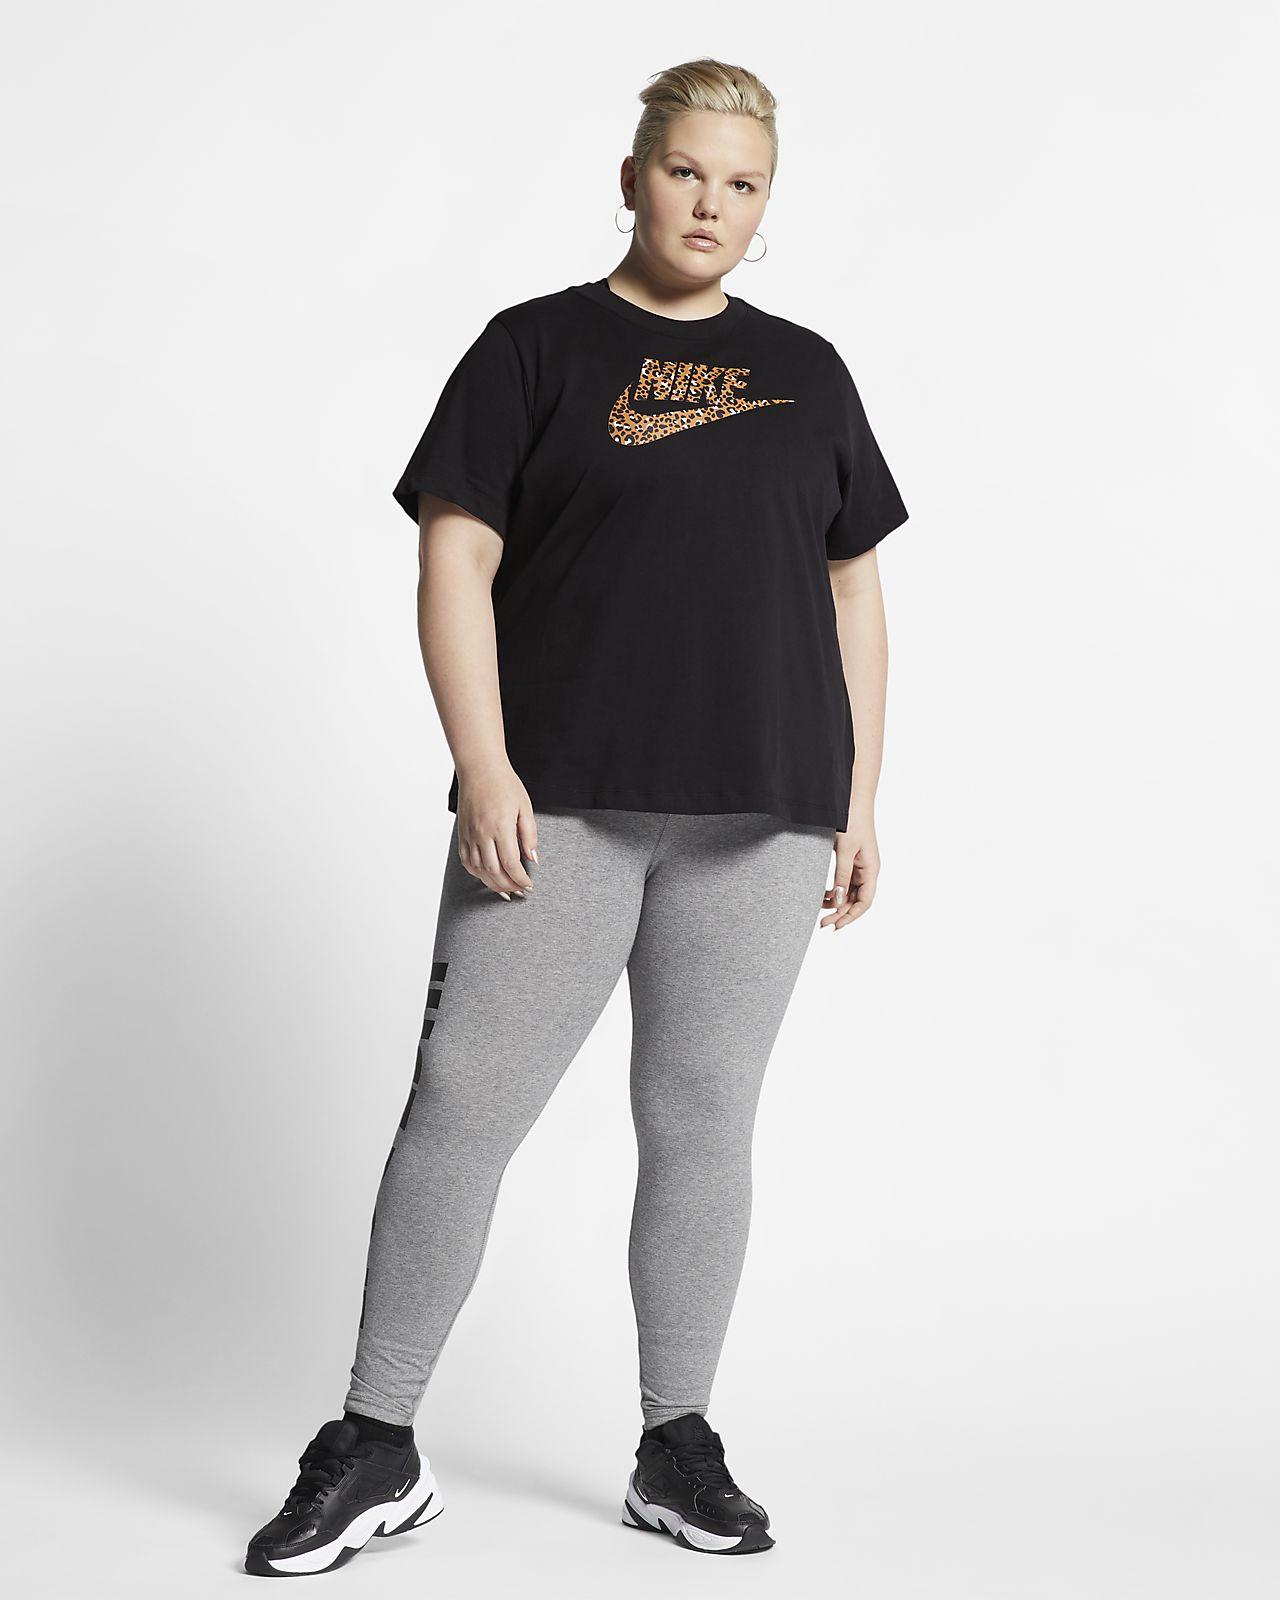 Haut à manches courtes Nike Sportswear Animal Print pour Femme (grande taille)